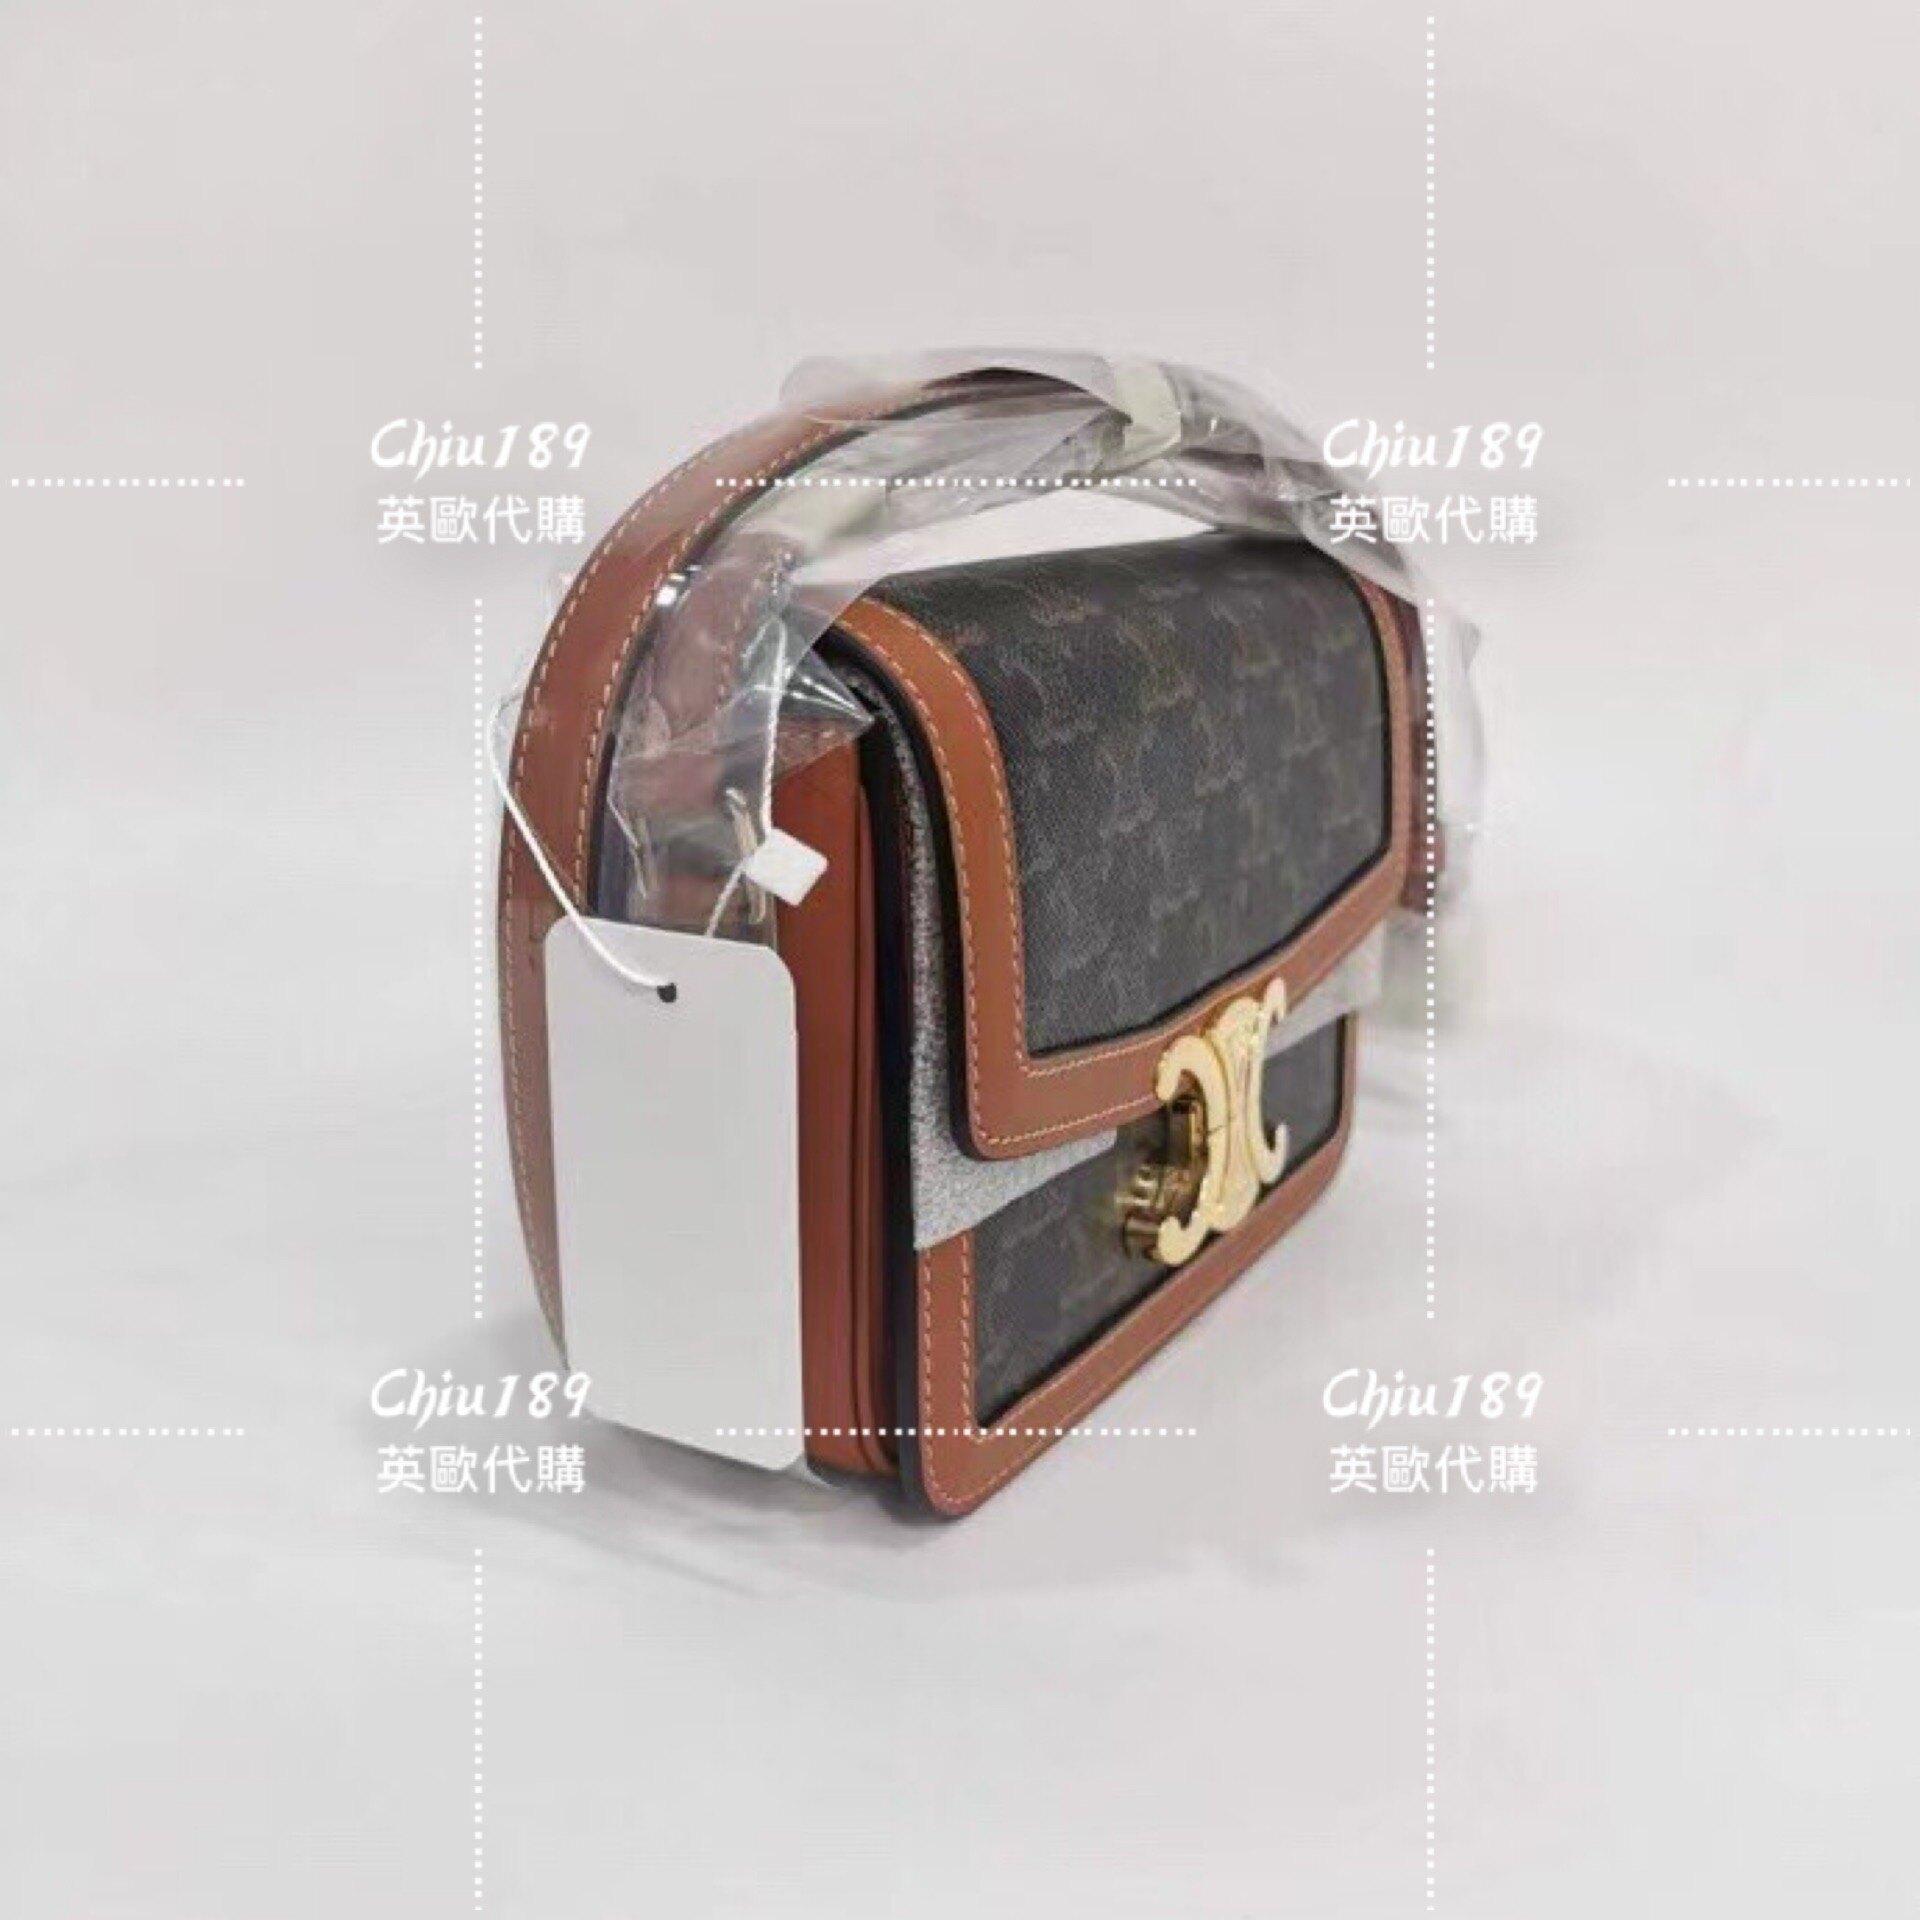 【Chiu189英歐代購】Celine Triomphe 凱旋門 老花 Box 肩背包 斜背包